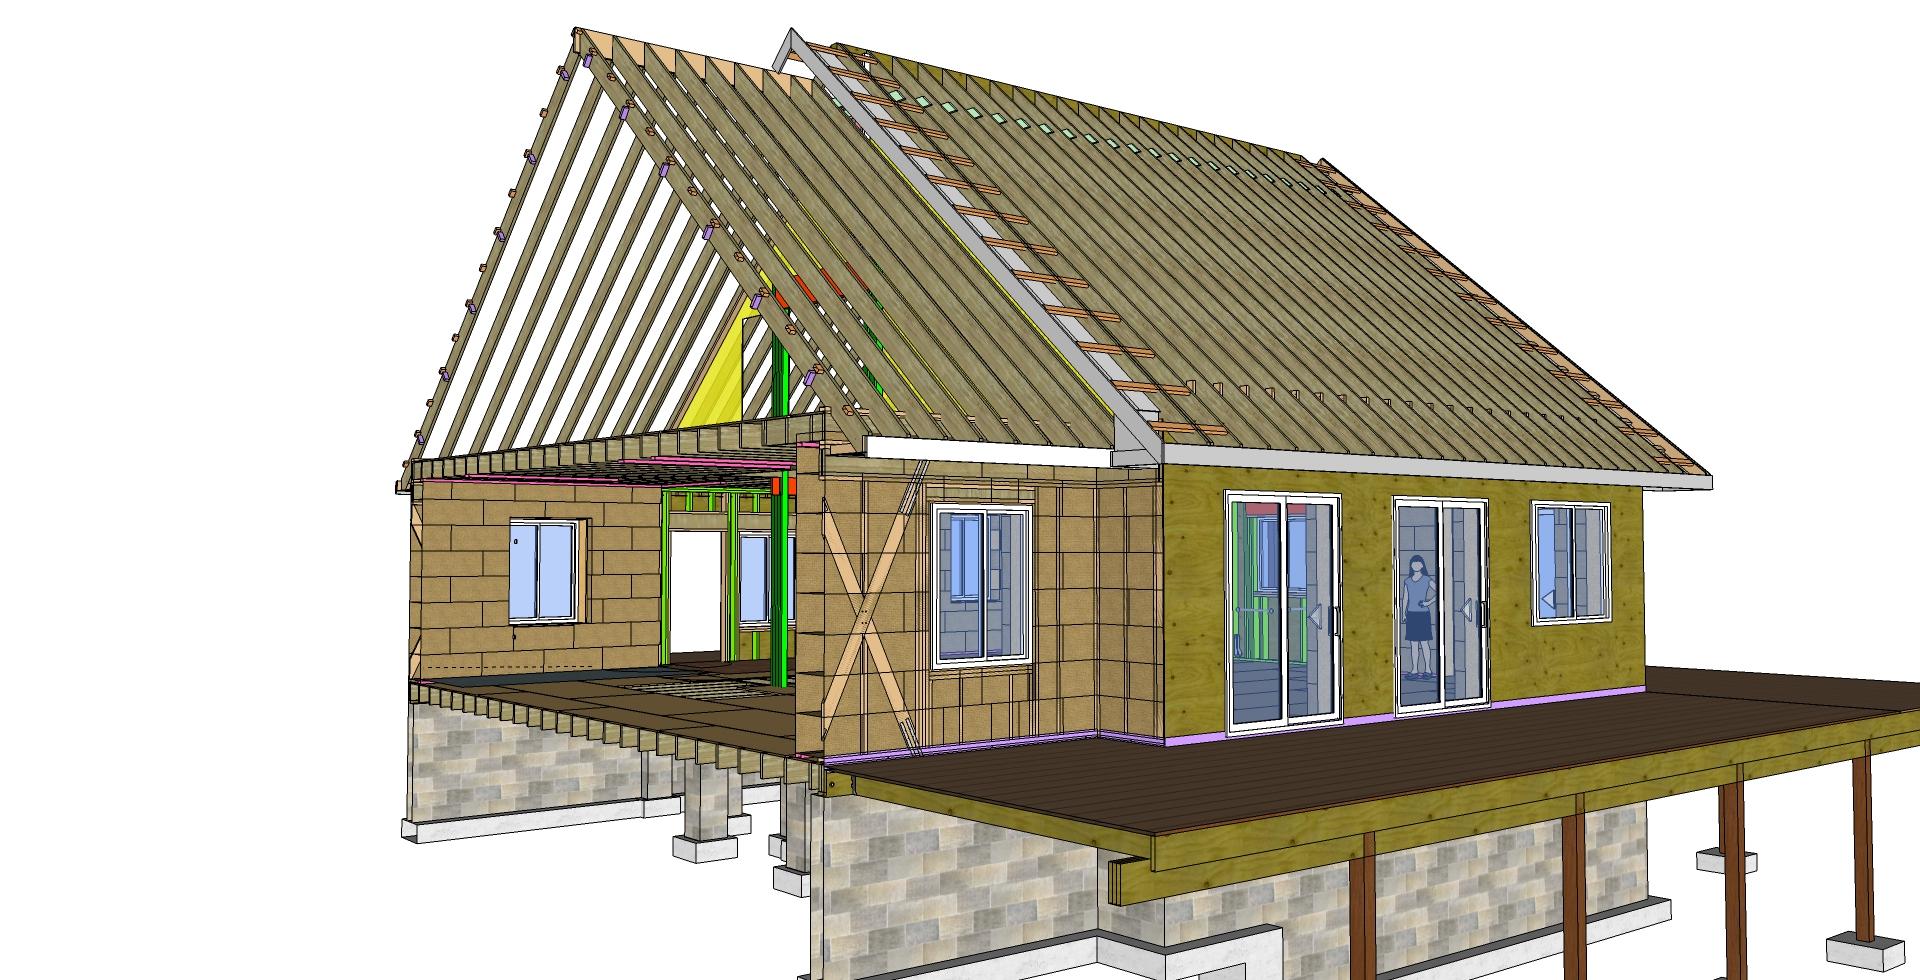 Straw Bale Home designed for Annika Valikhovskaya and Joe Orenstein in Alton, VA.